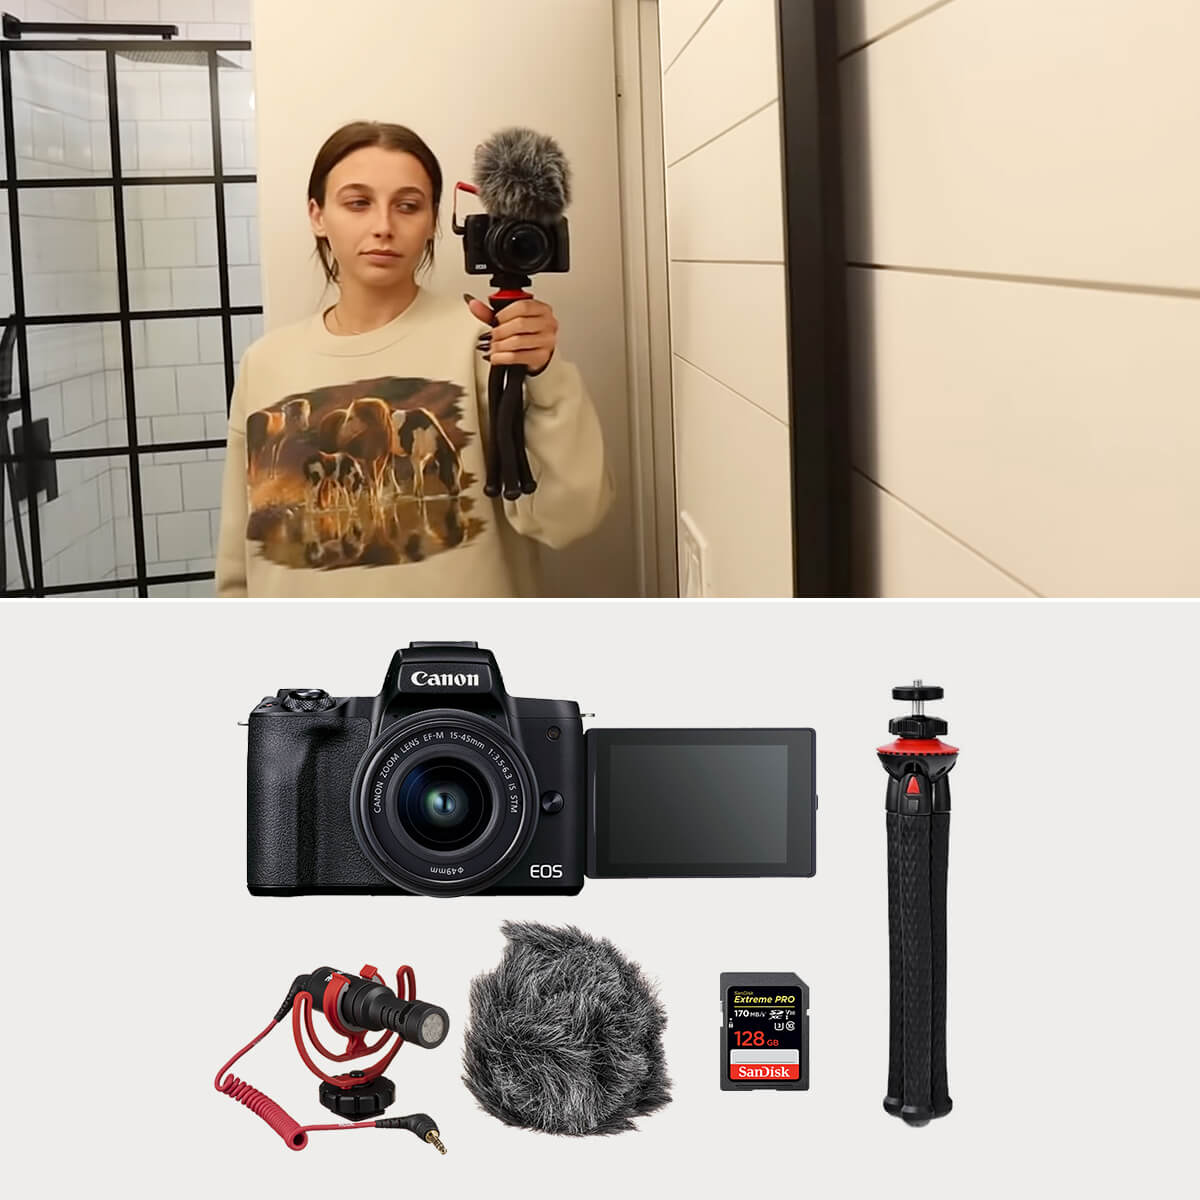 What Camera Does Emma Chamberlain use?